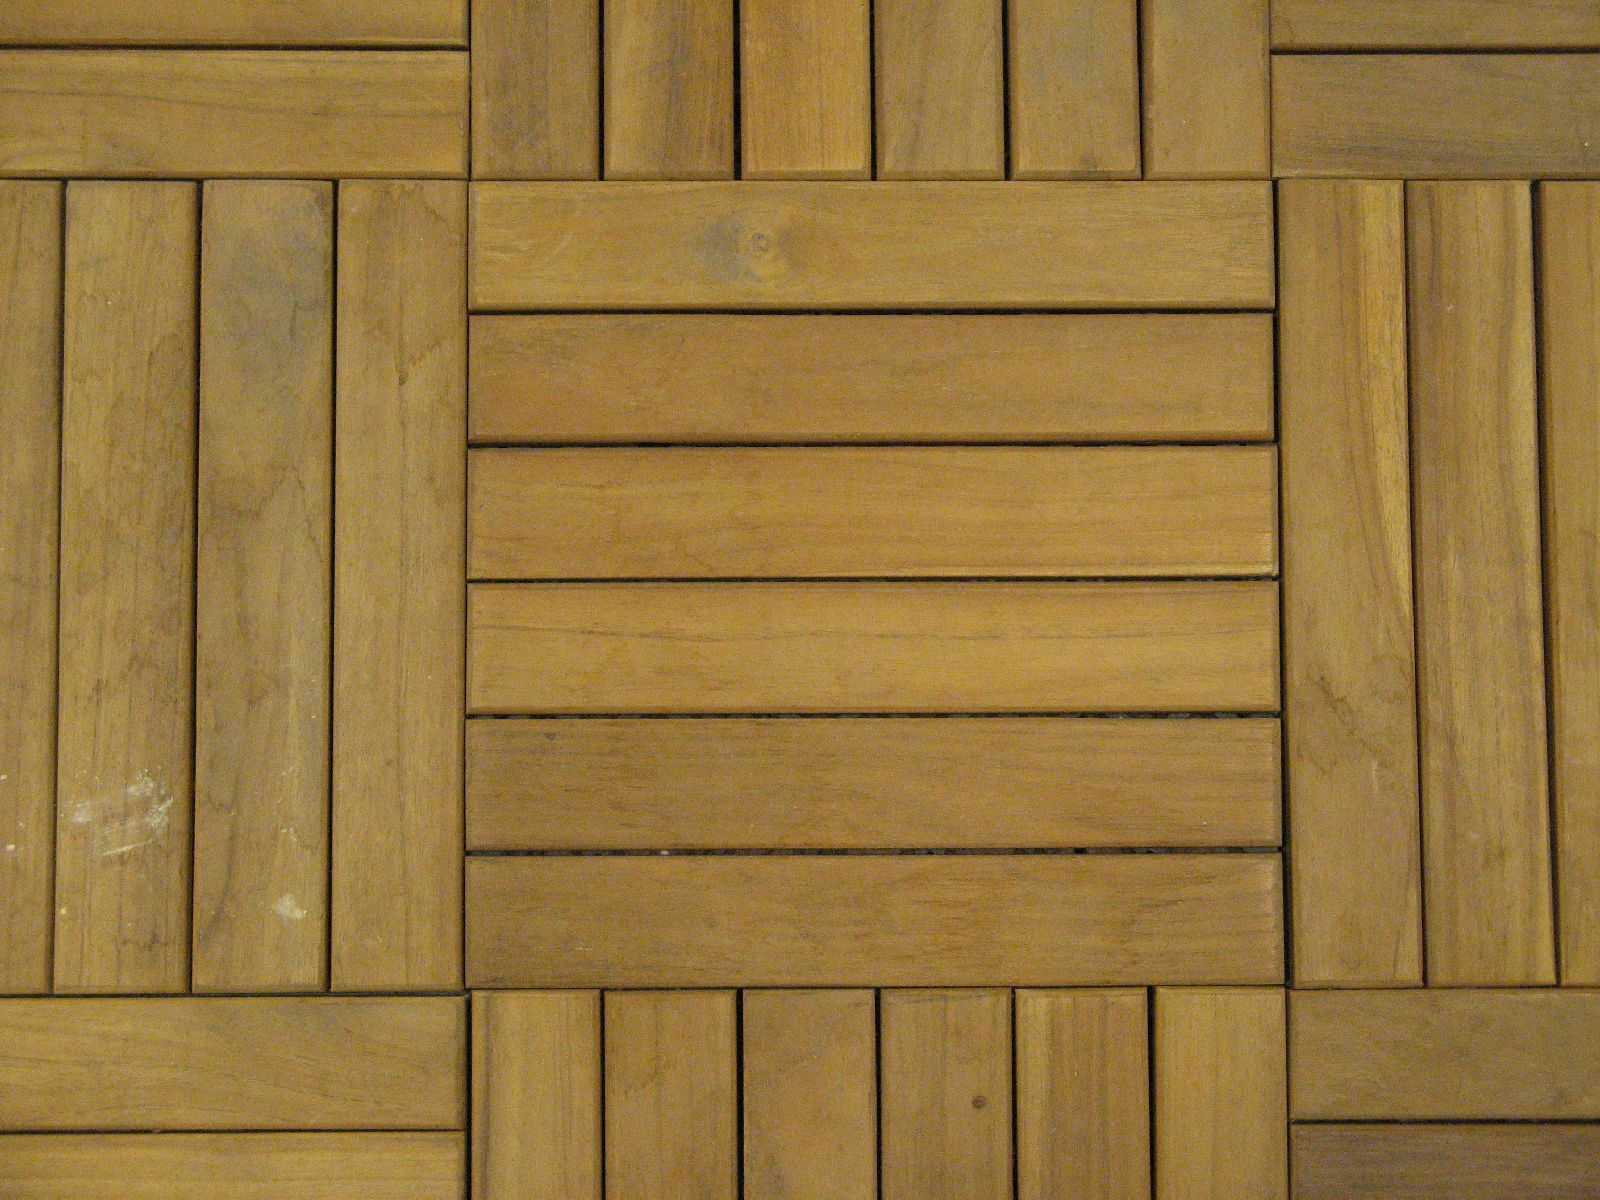 Wood_Textures_B_4888